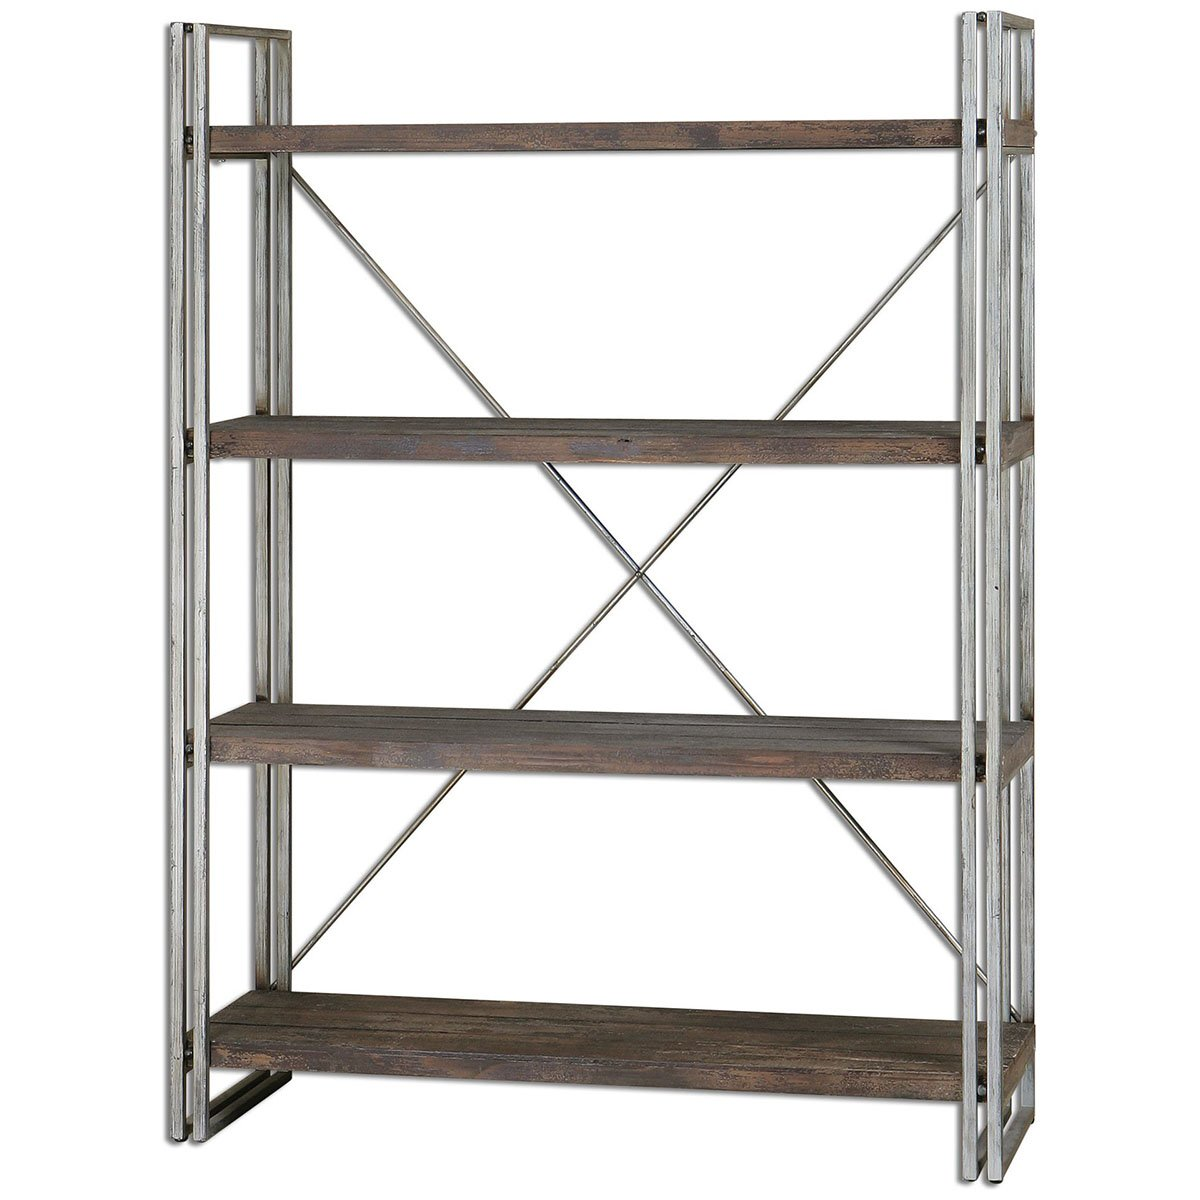 Amazon com uttermost 24396 greeley metal etagere shelf unit kitchen dining